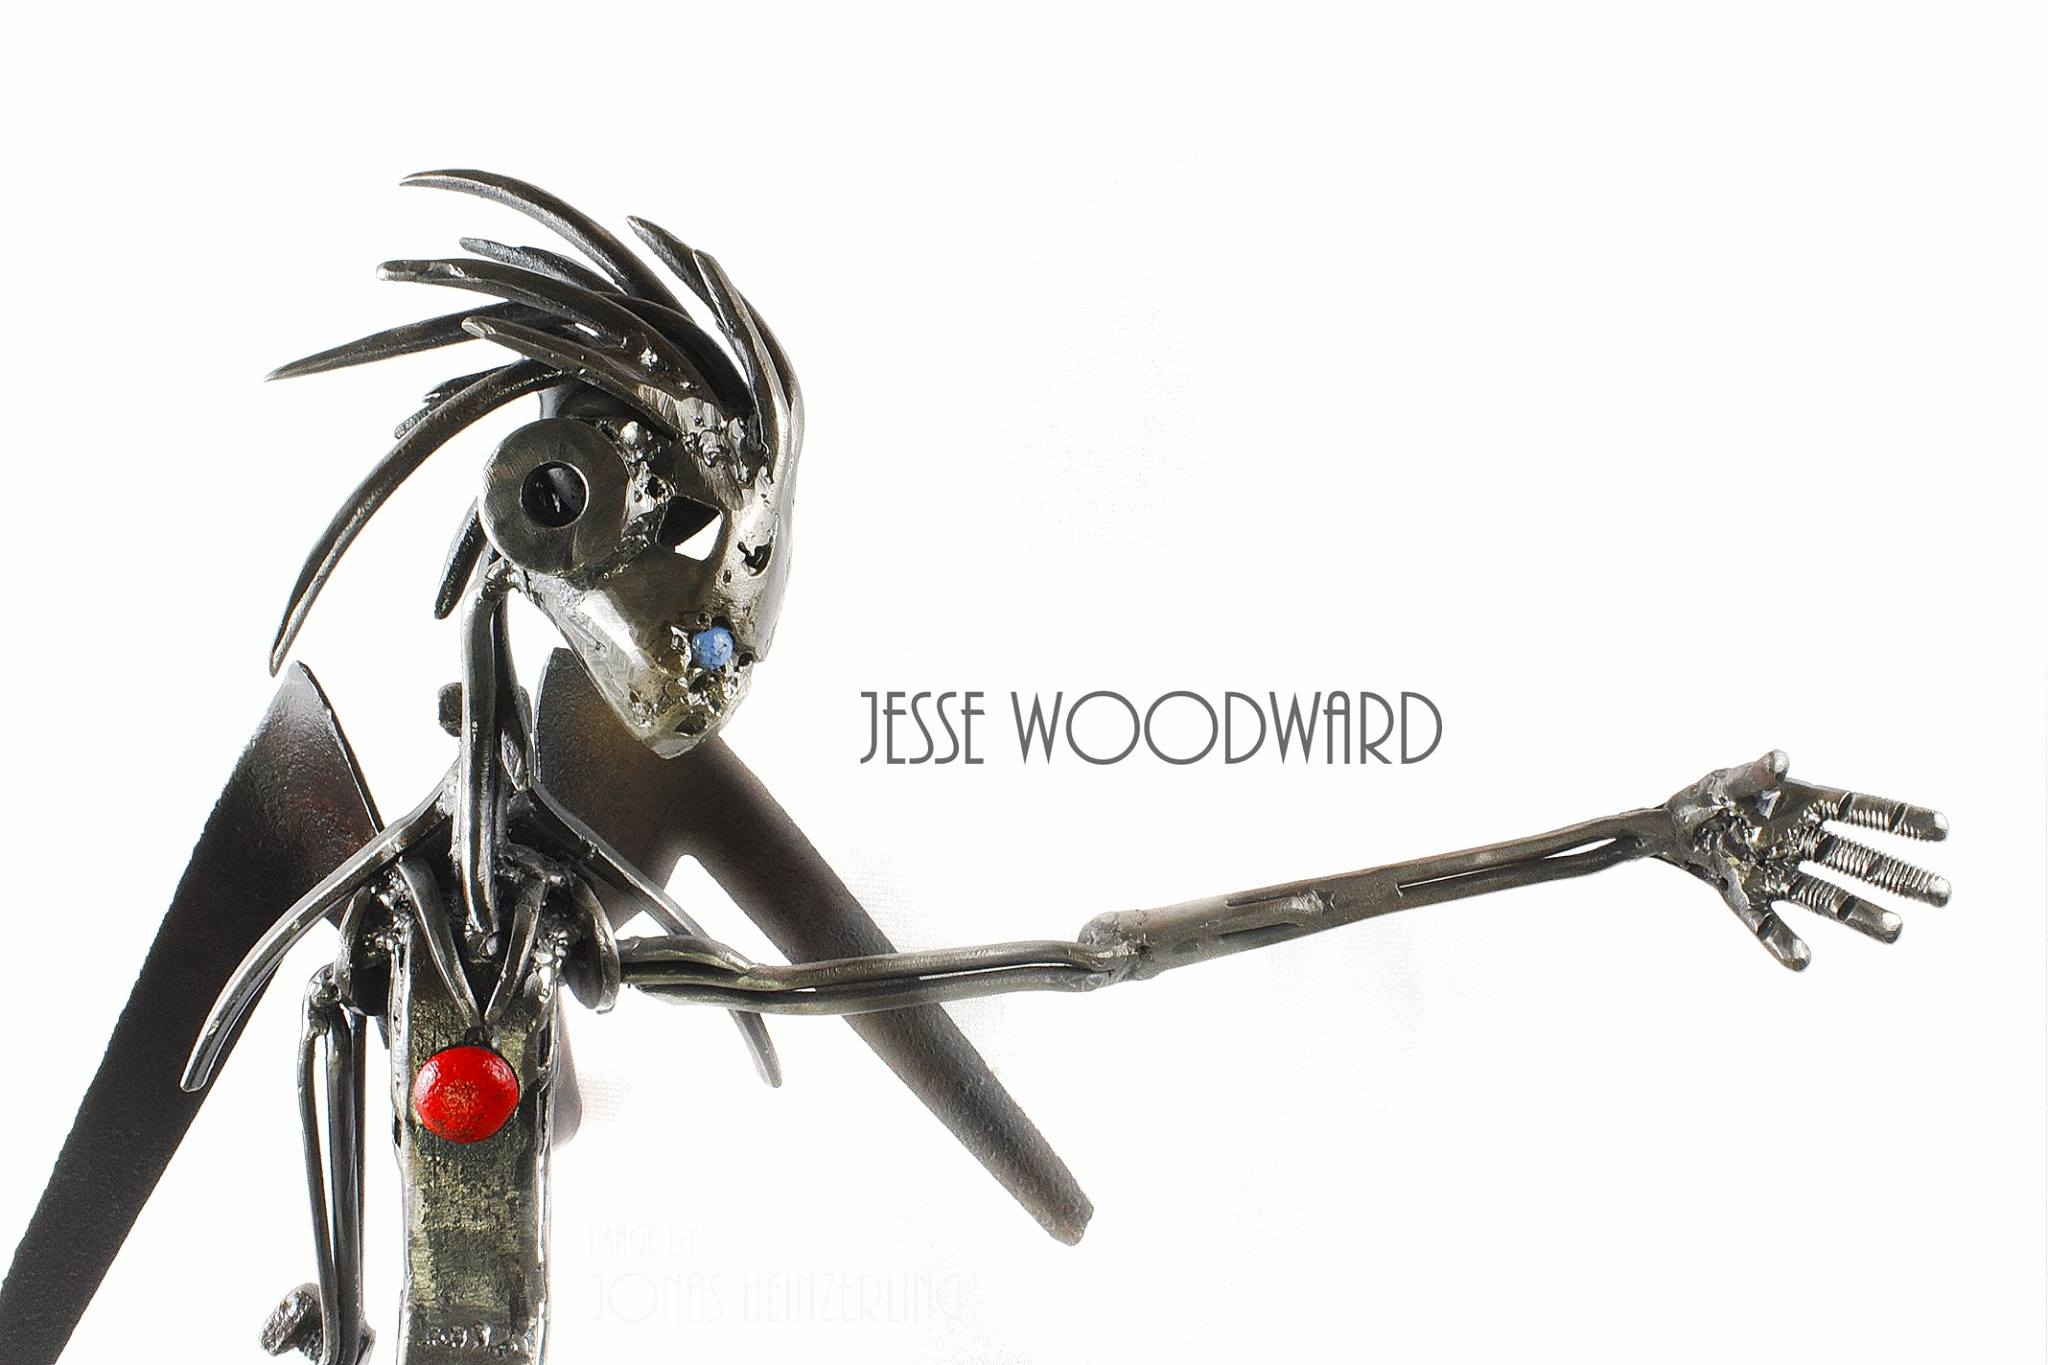 JesseWoodward